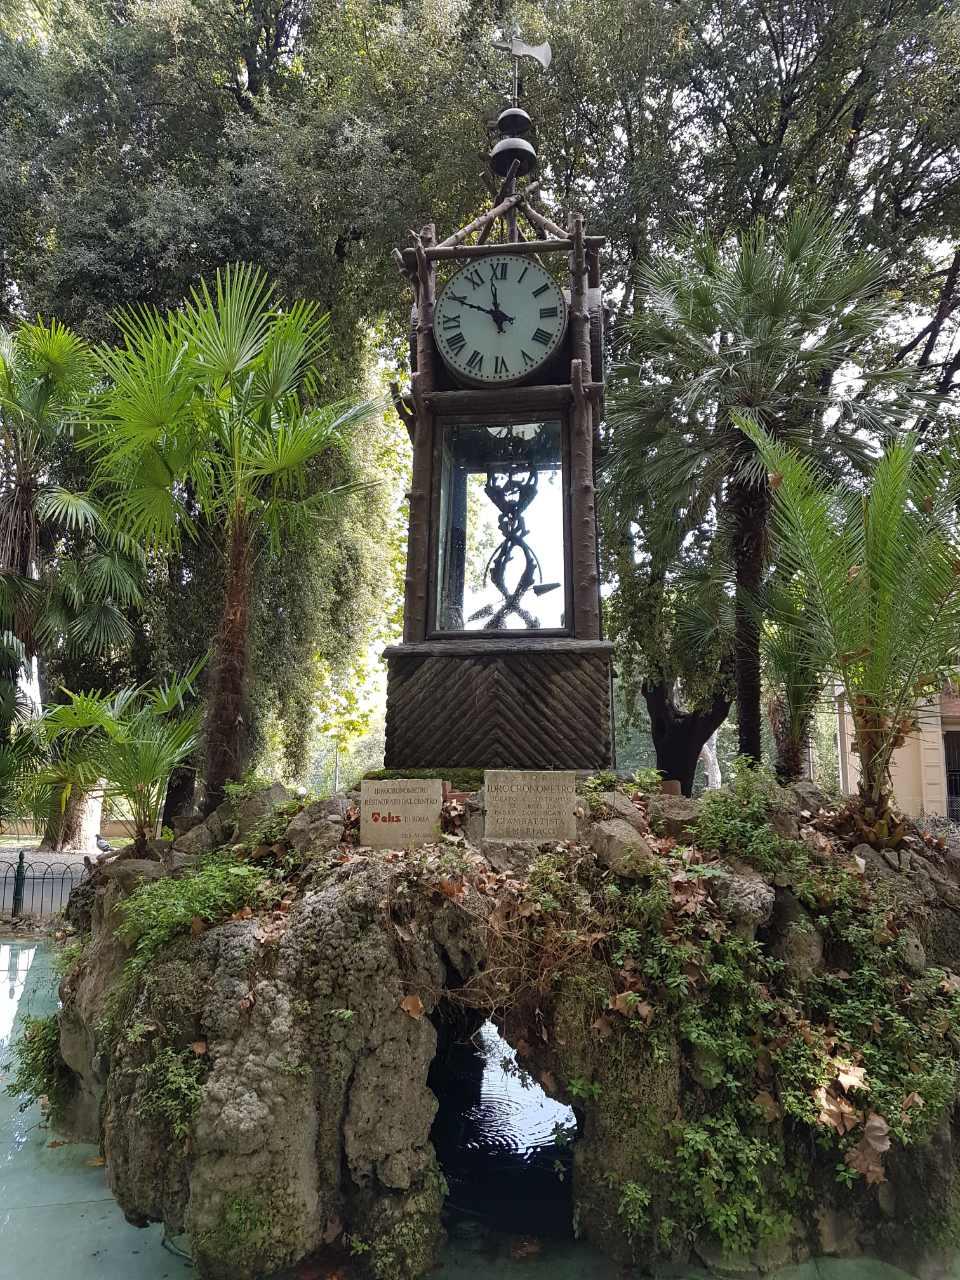 Water clock of Villa Borghese - Rome - Italy private tour